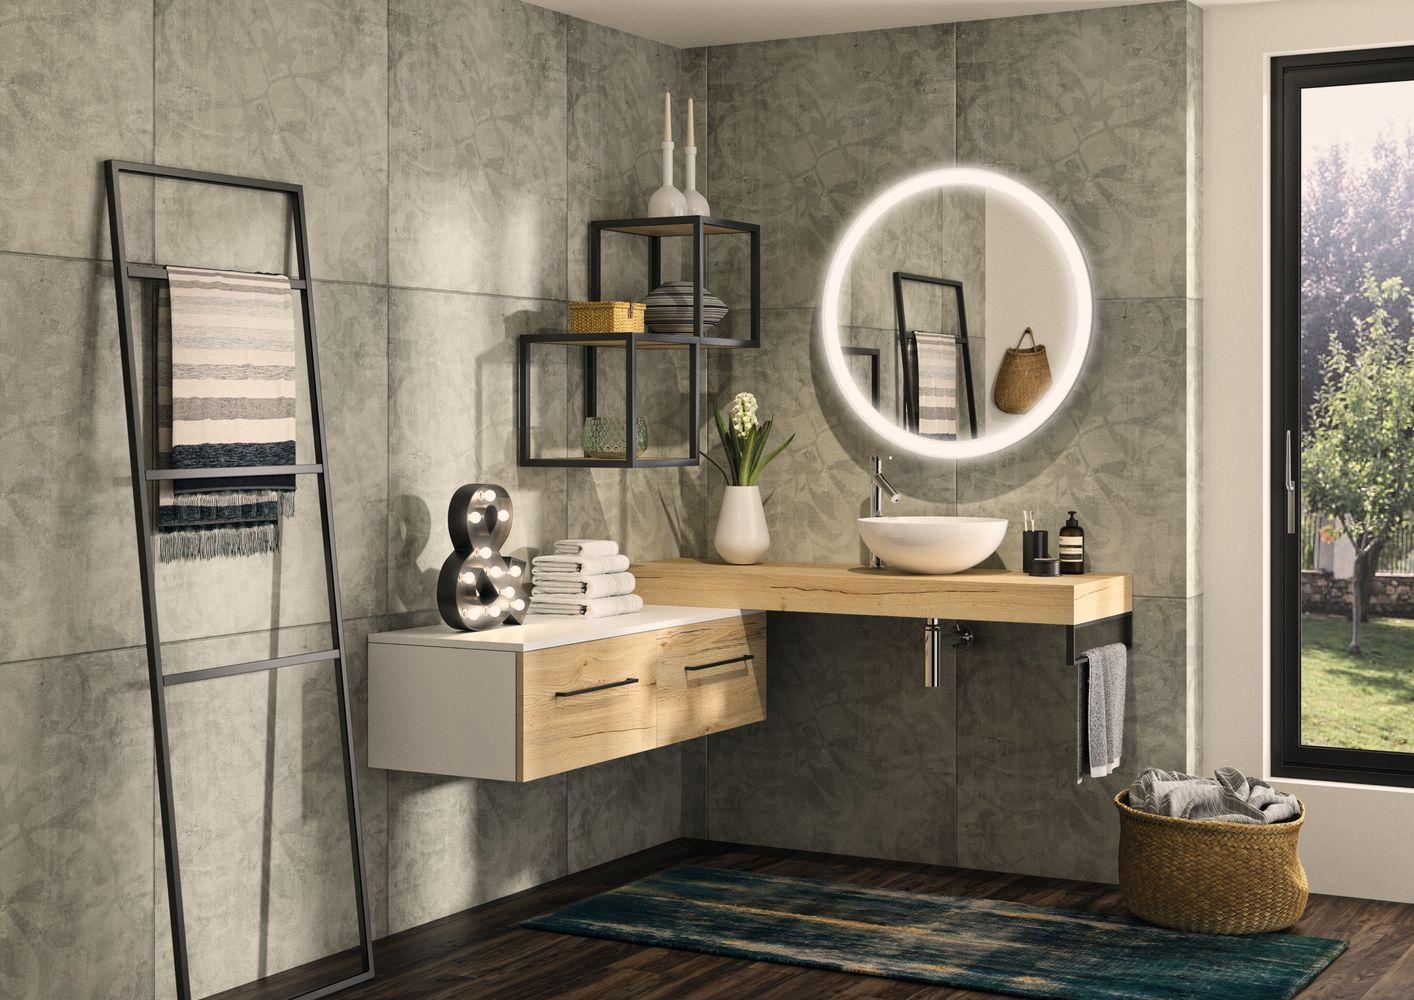 Salle de bain style industriel meuble FACTORY 1 | VM | Aménagement ...